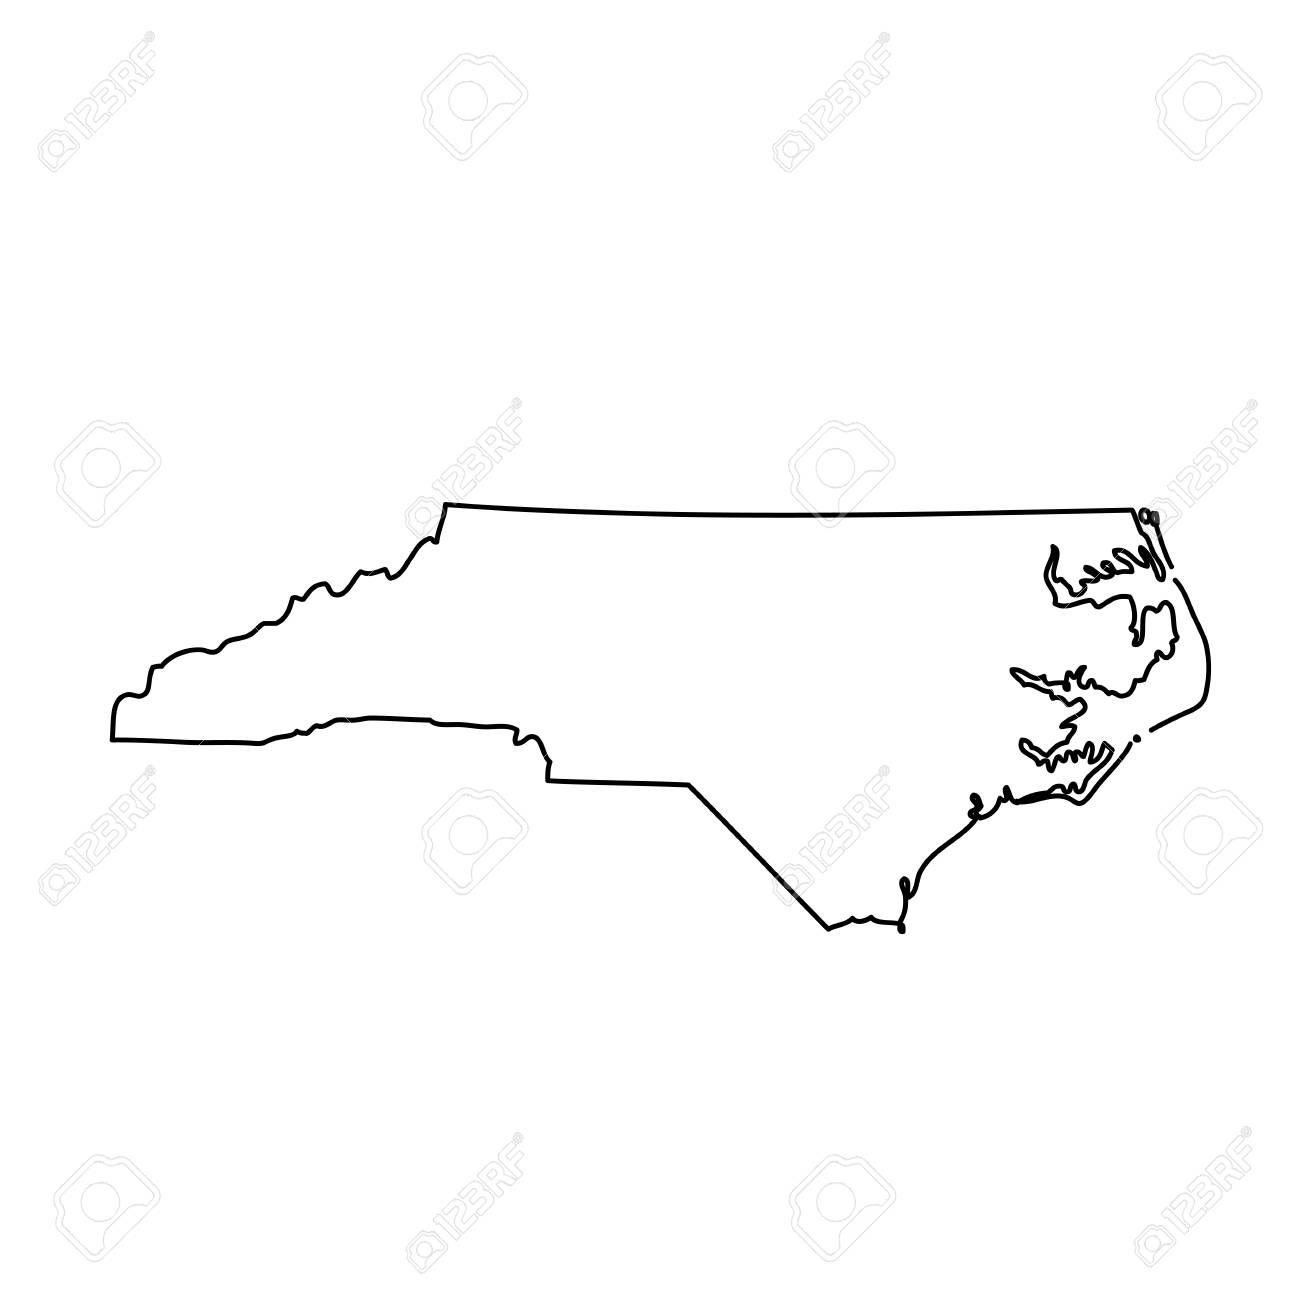 map of the U.S. state North Carolina.